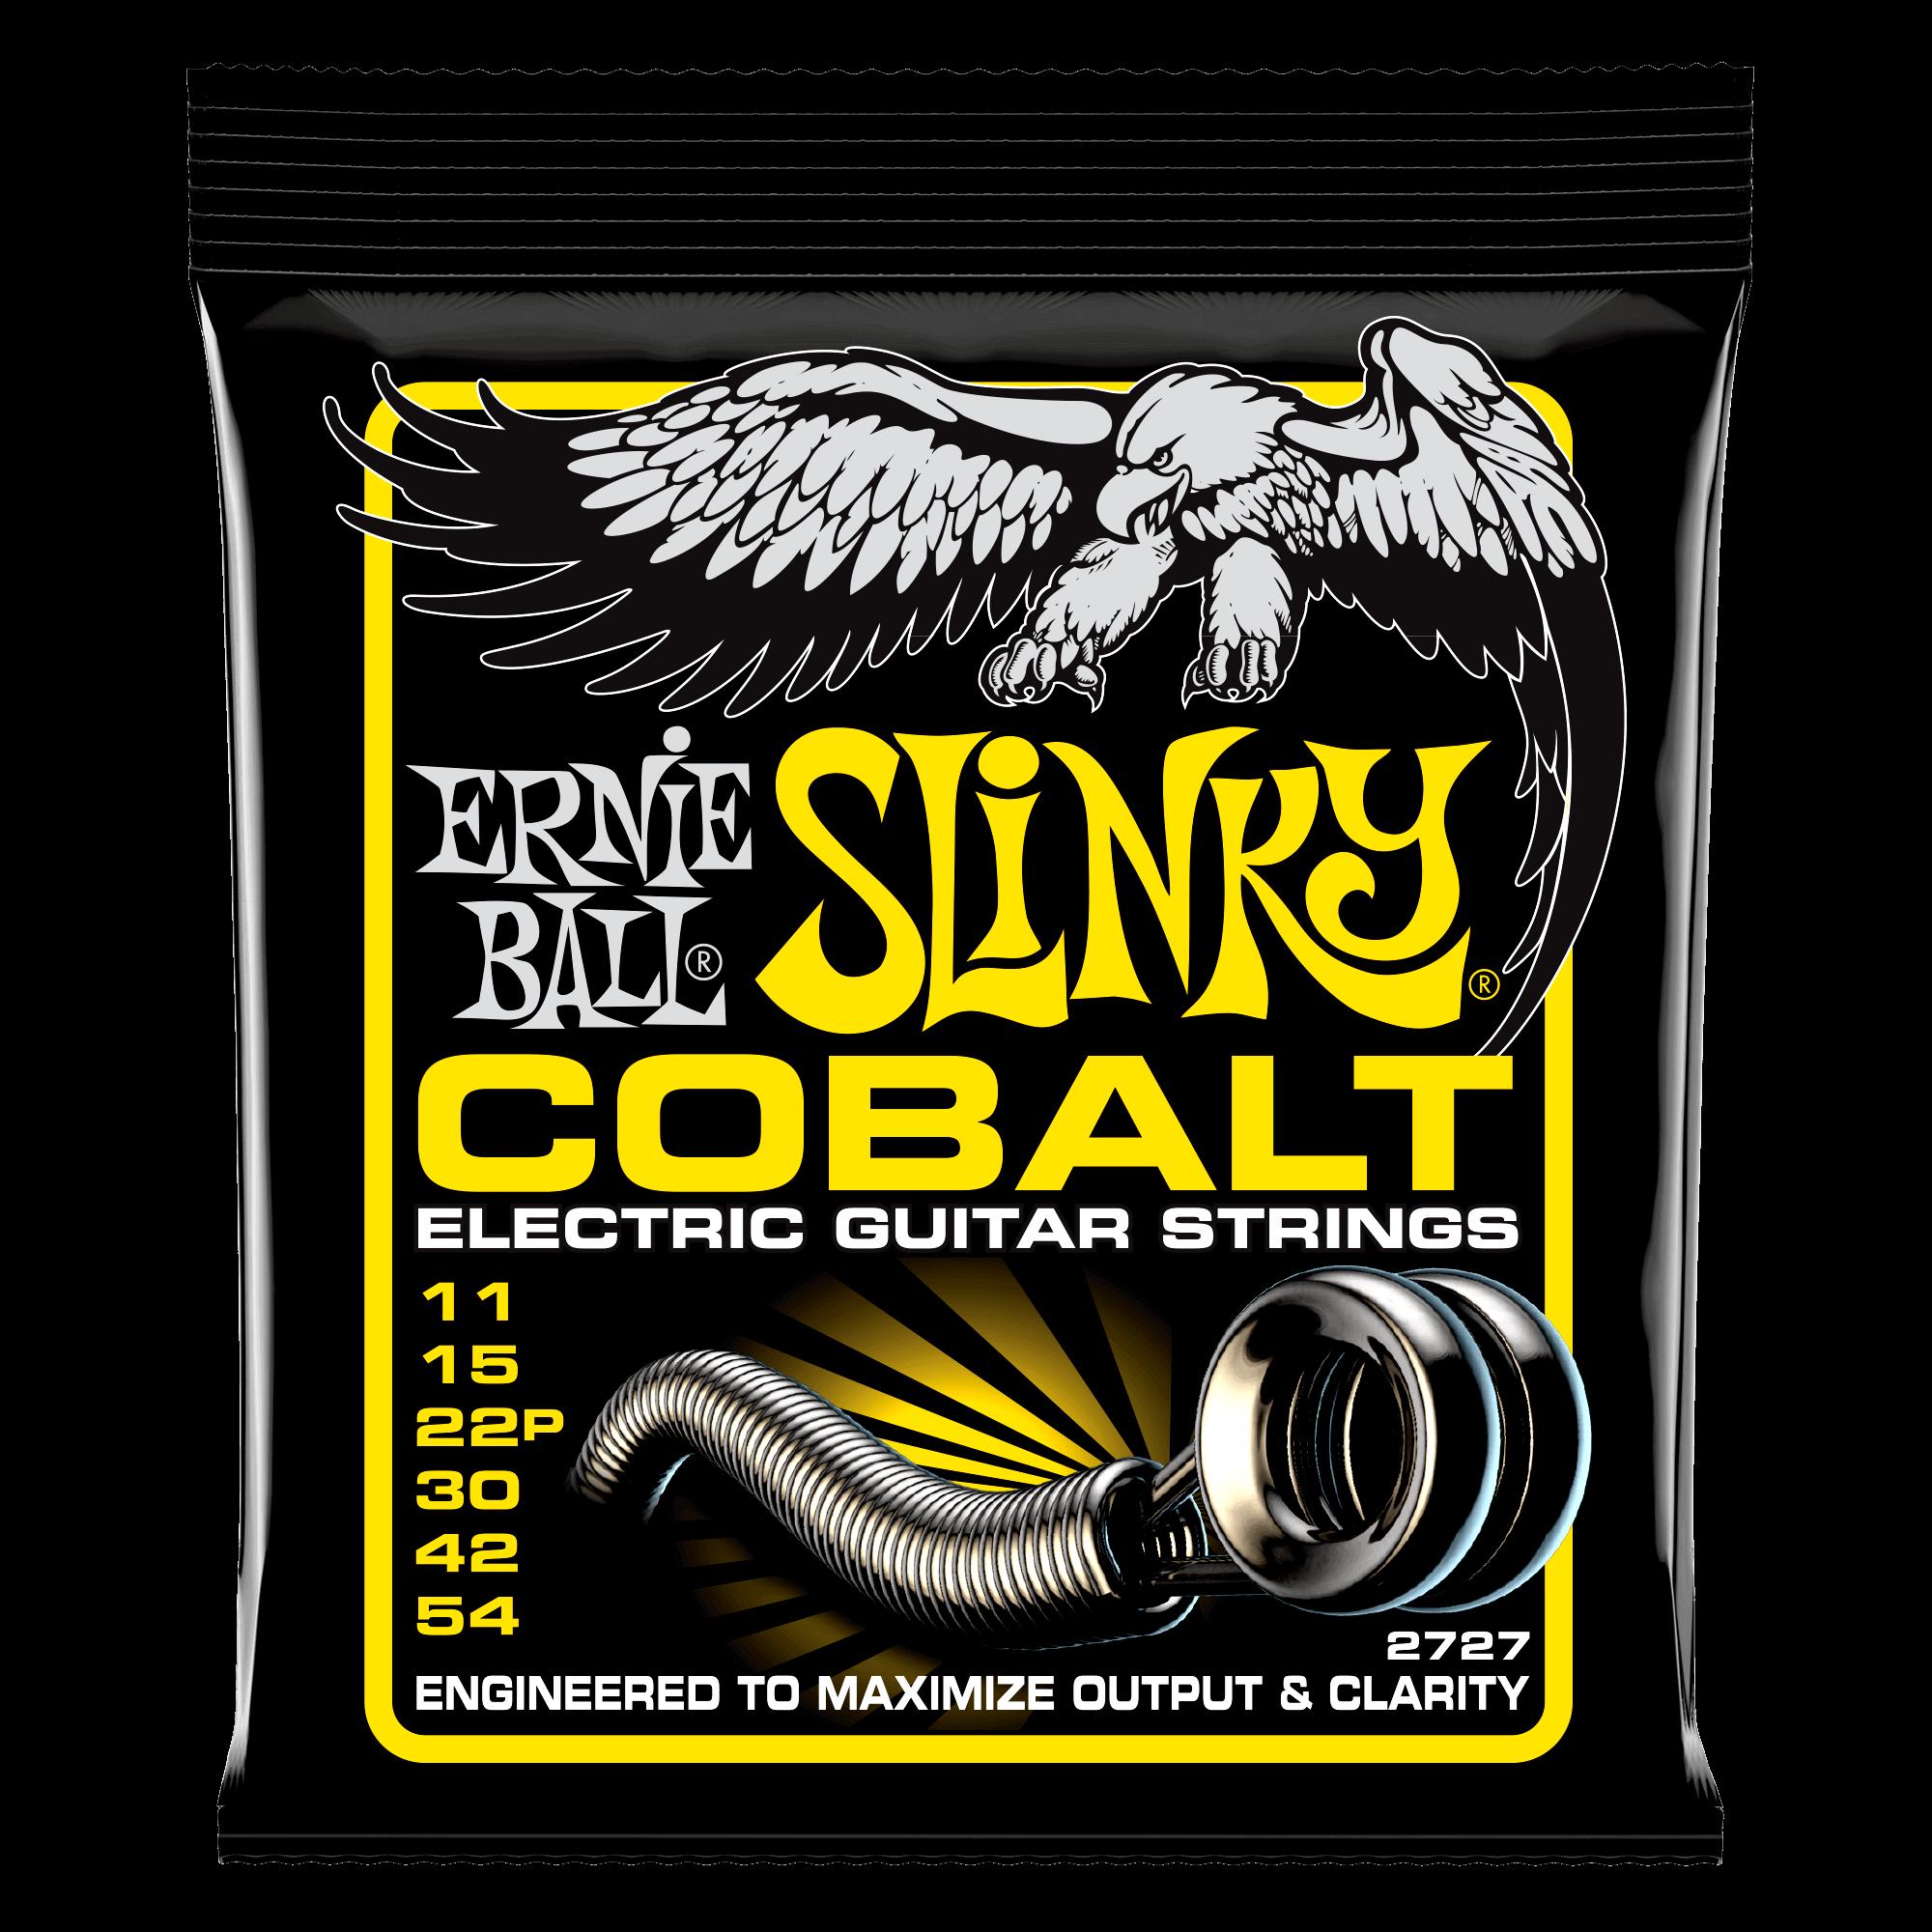 Ernie Ball Cobalt Slinky Electric Guitar Strings